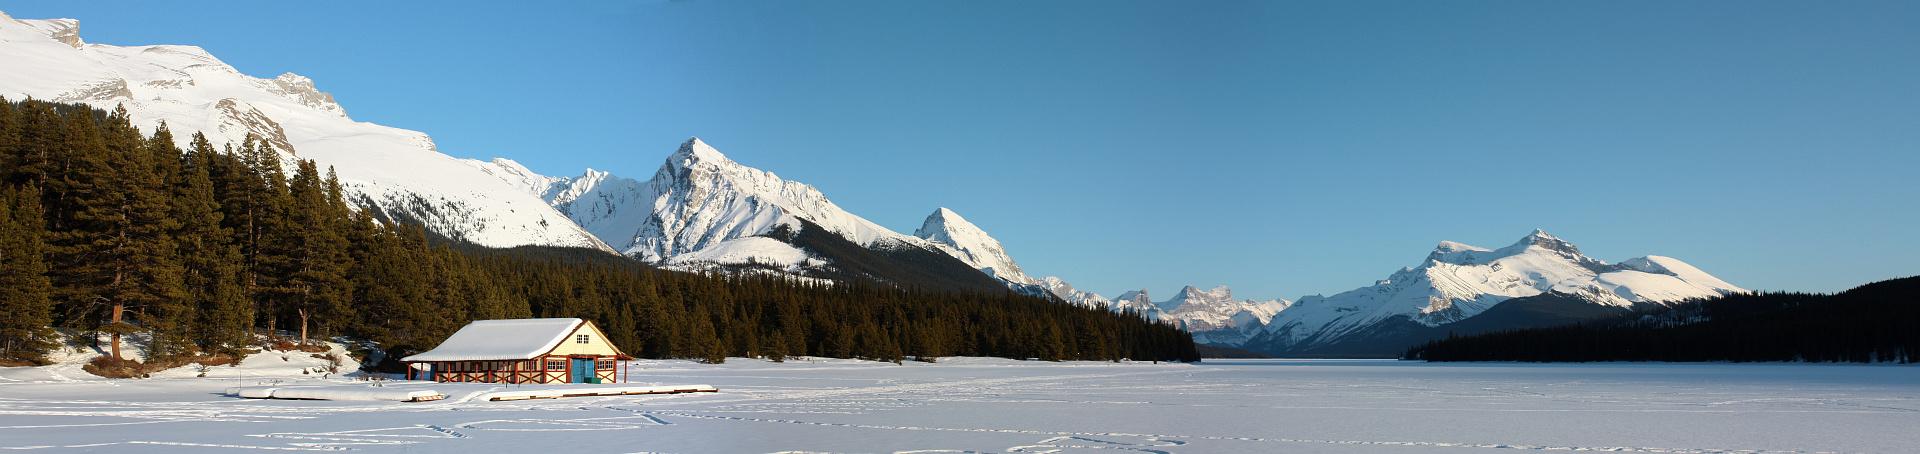 Maligne Lake Panorama